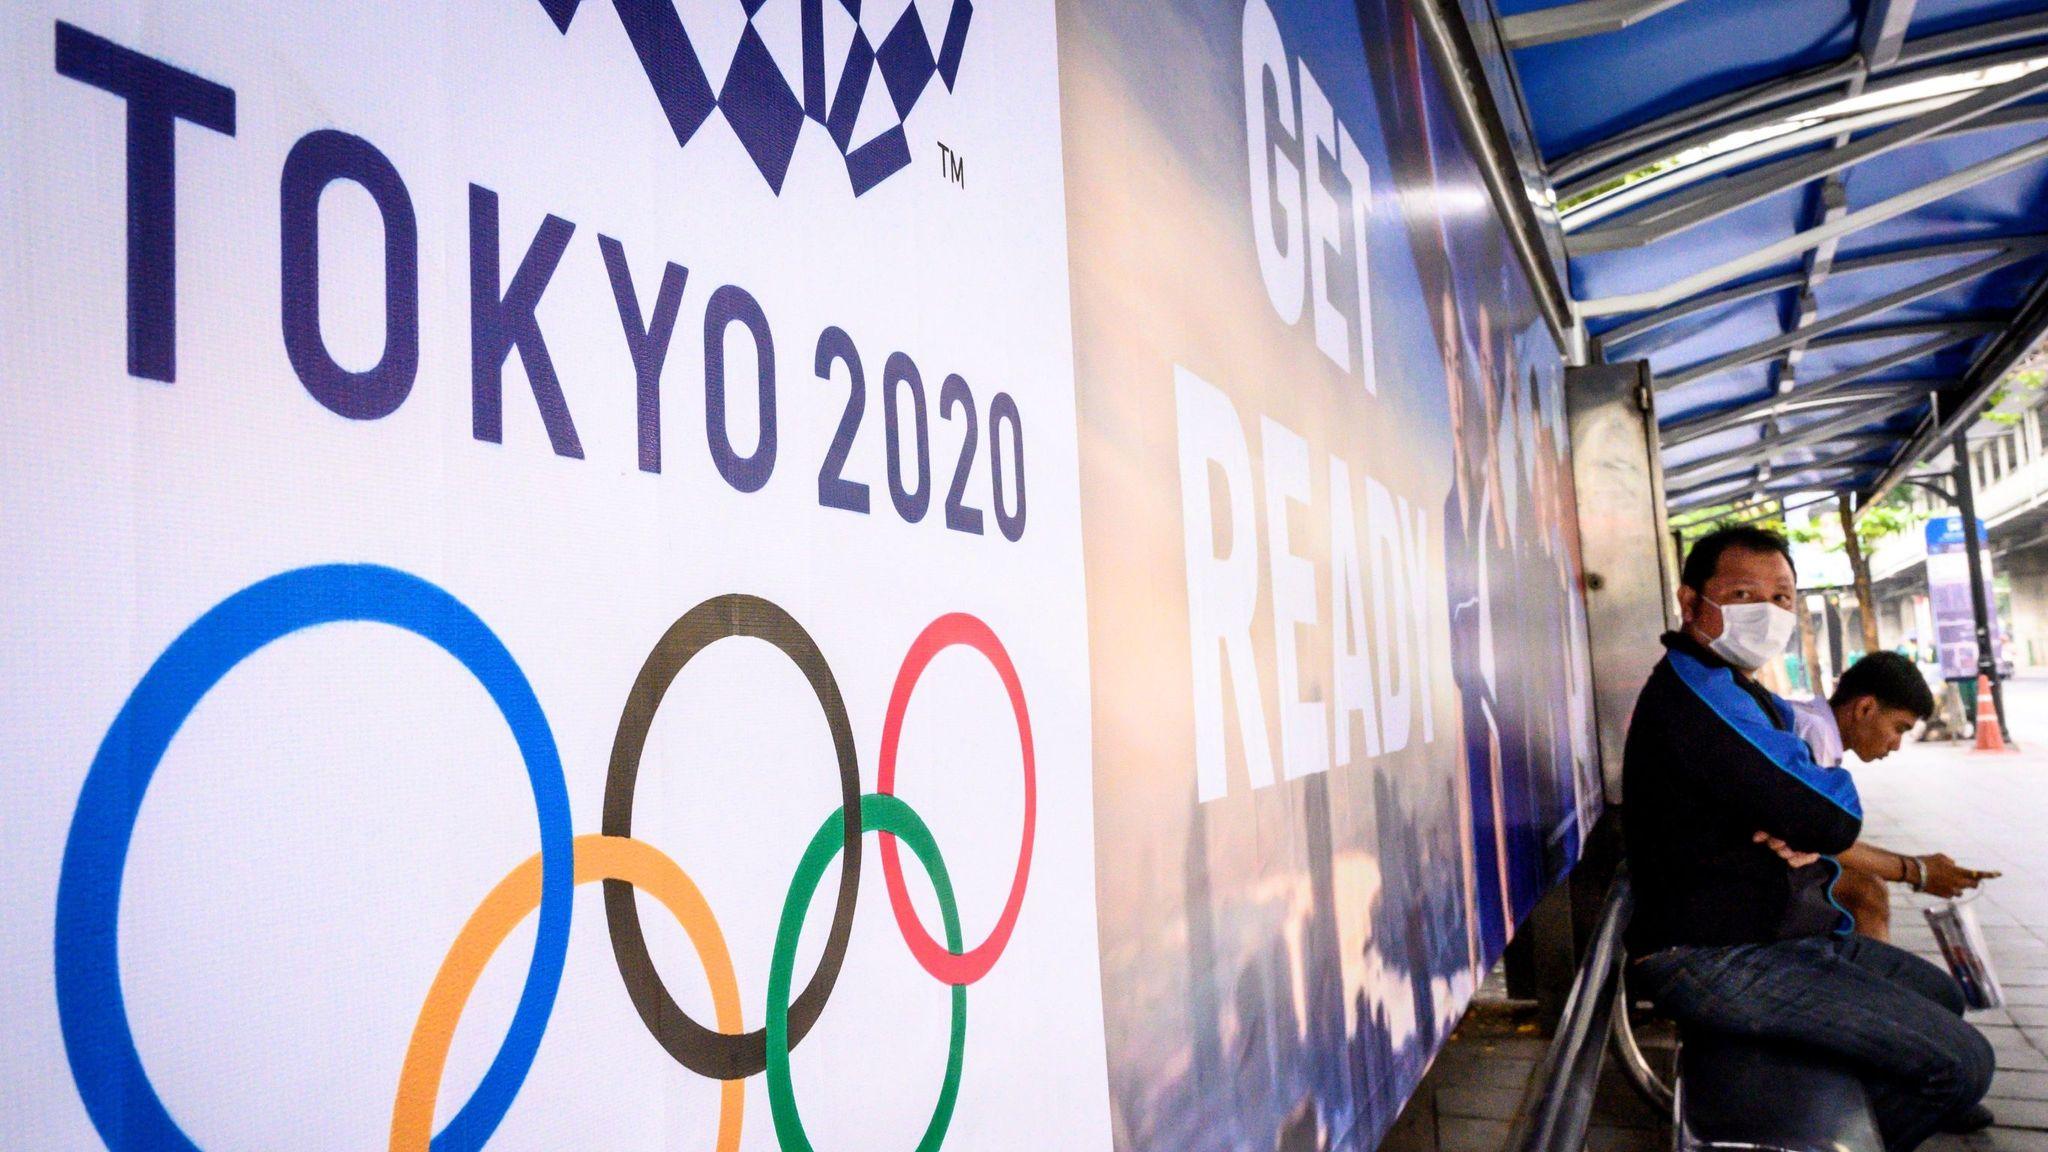 Olympic torch lighting 2021 betting odds shadow fiend dota 2 item betting